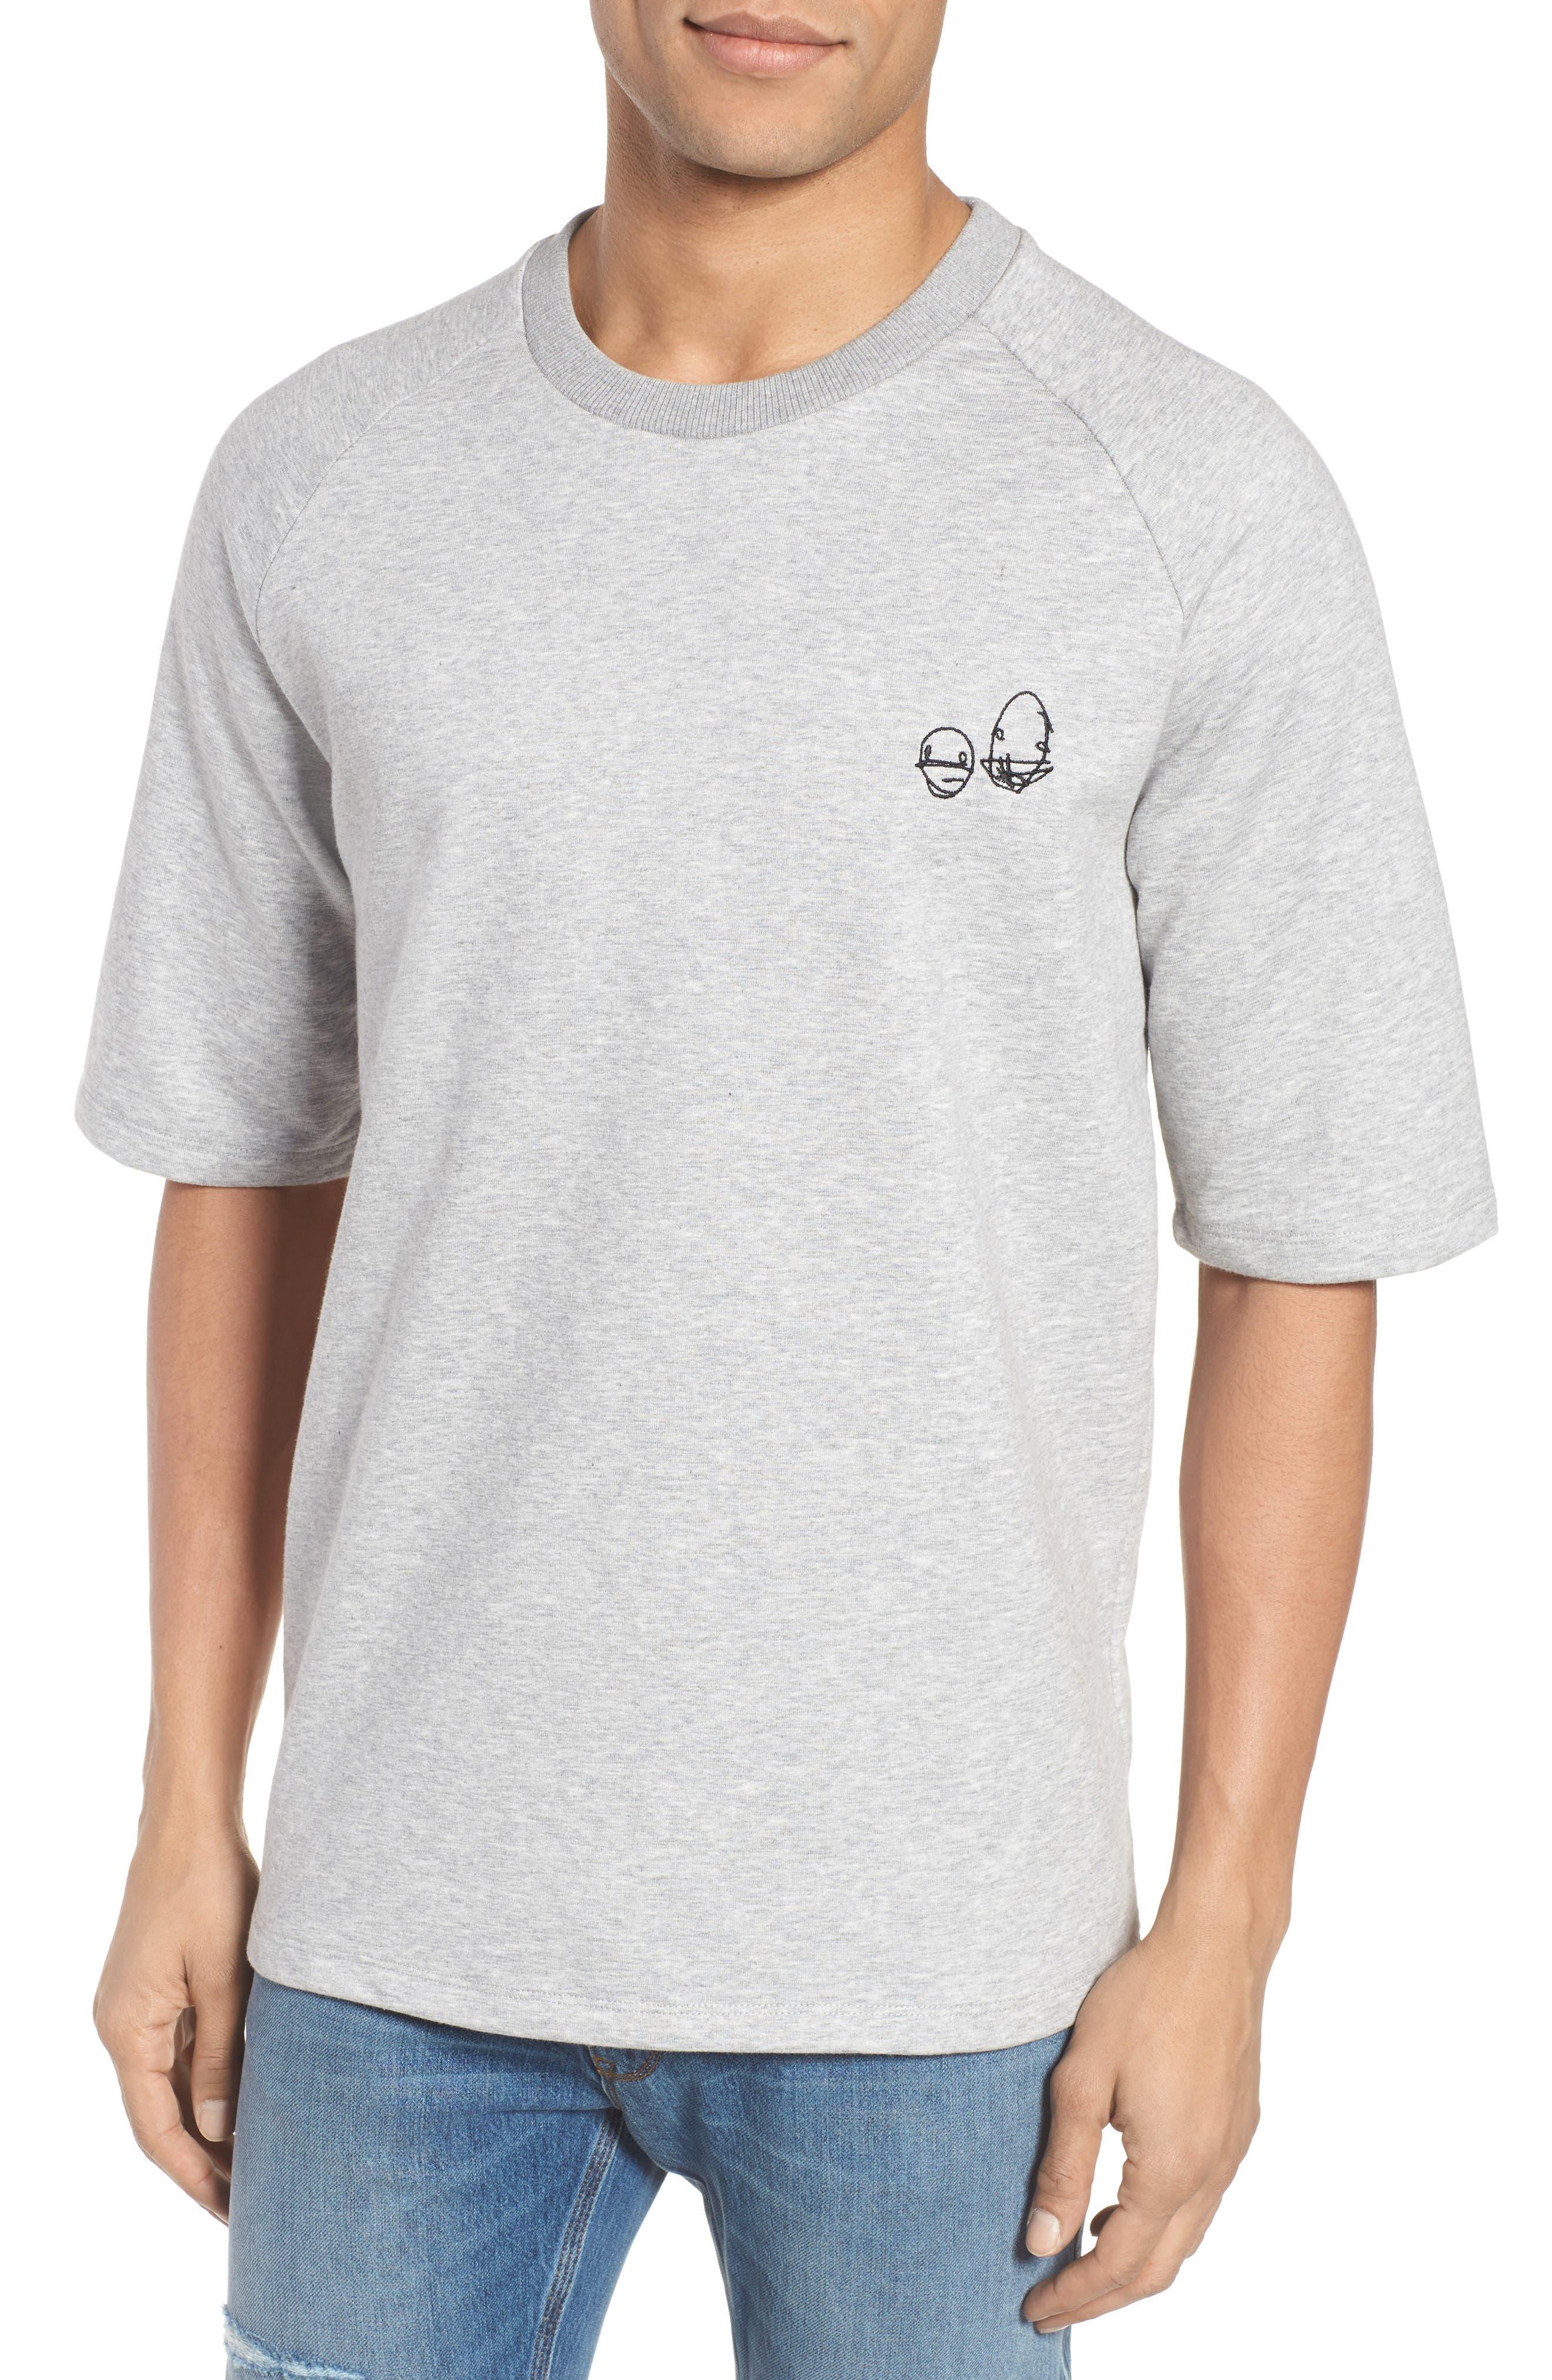 Deast Doodle Sweatshirt,                         Main,                         color, 061